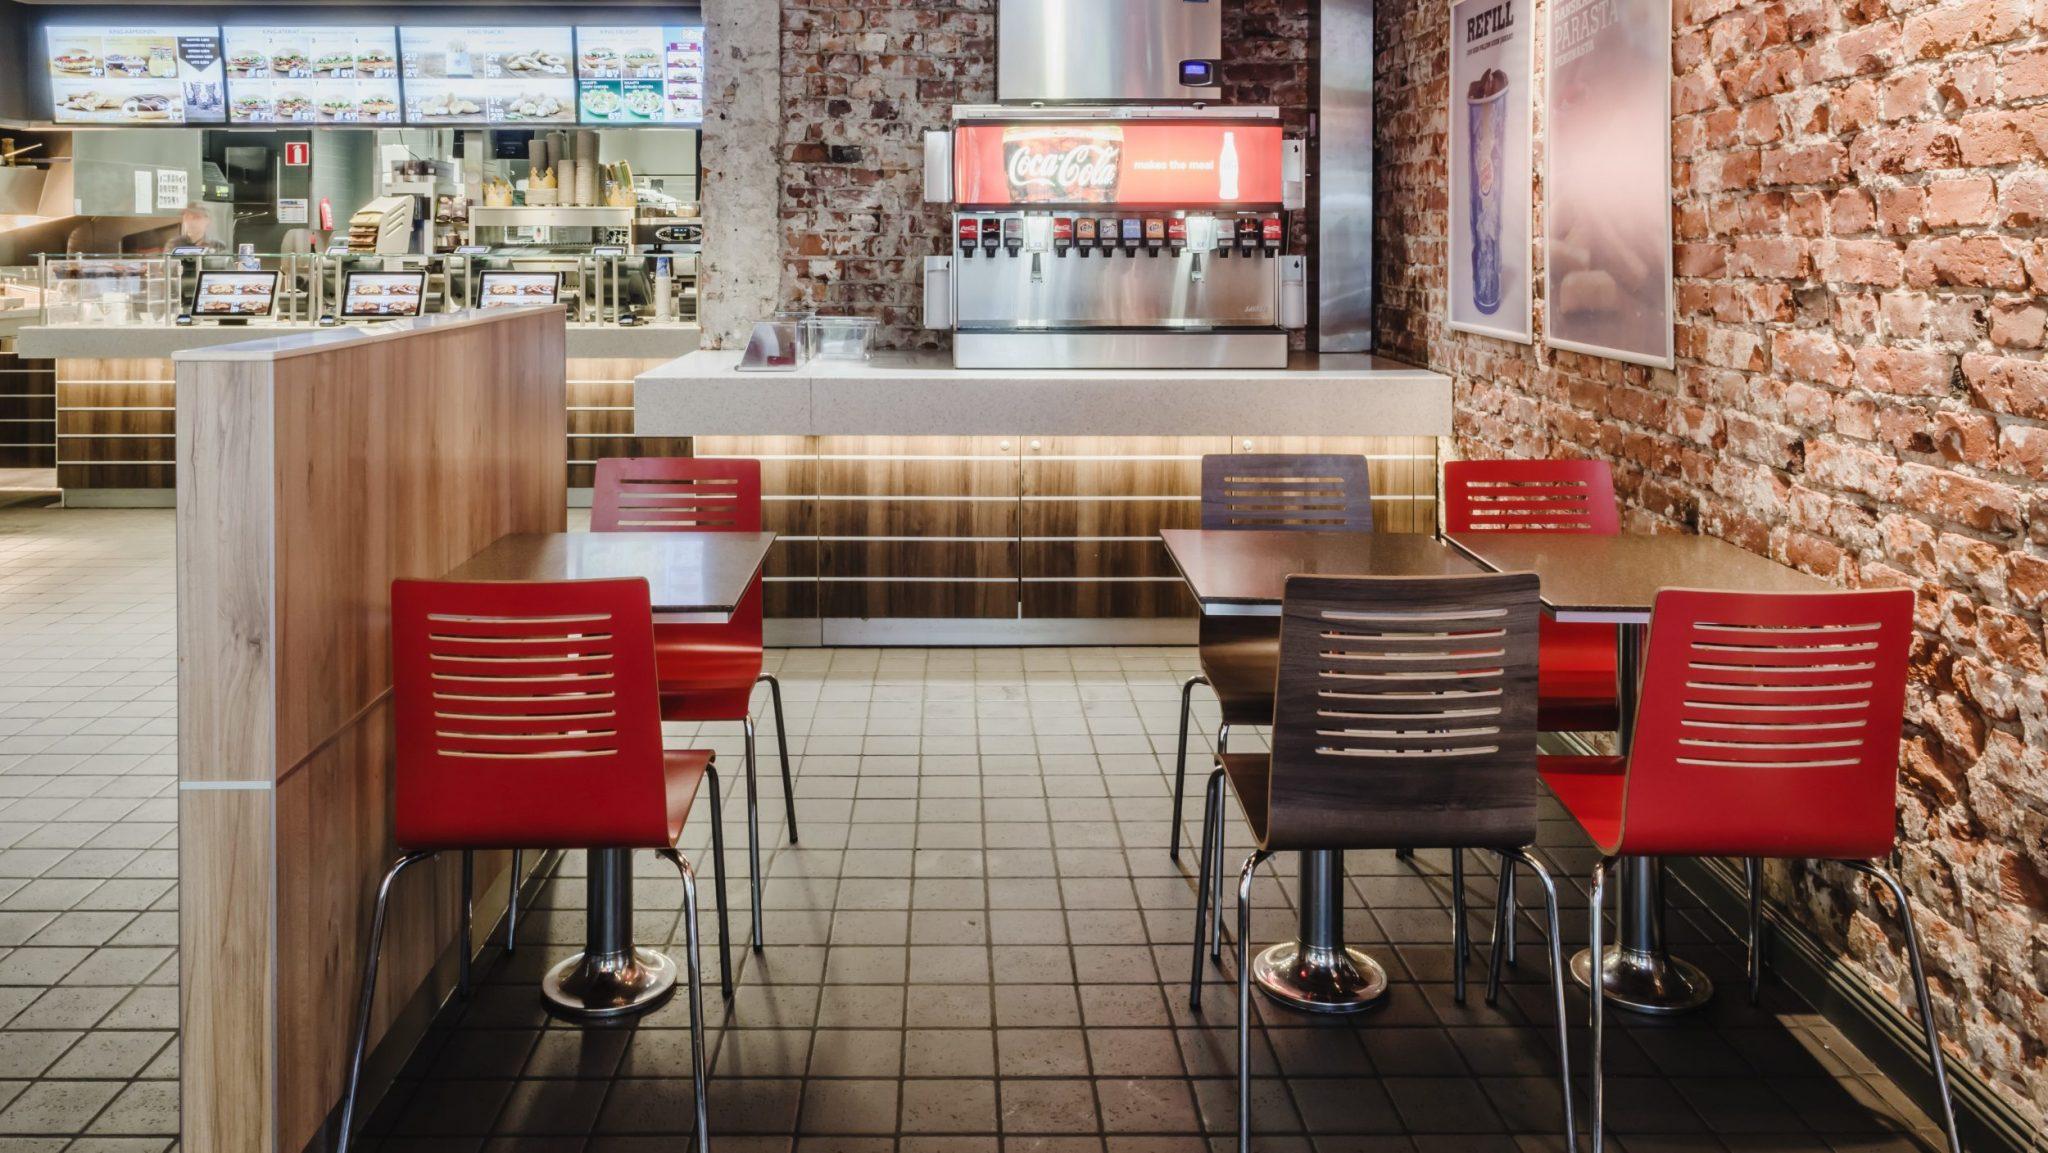 Burger-King-Mannerheimintie-Helsinki-GI-Project-3